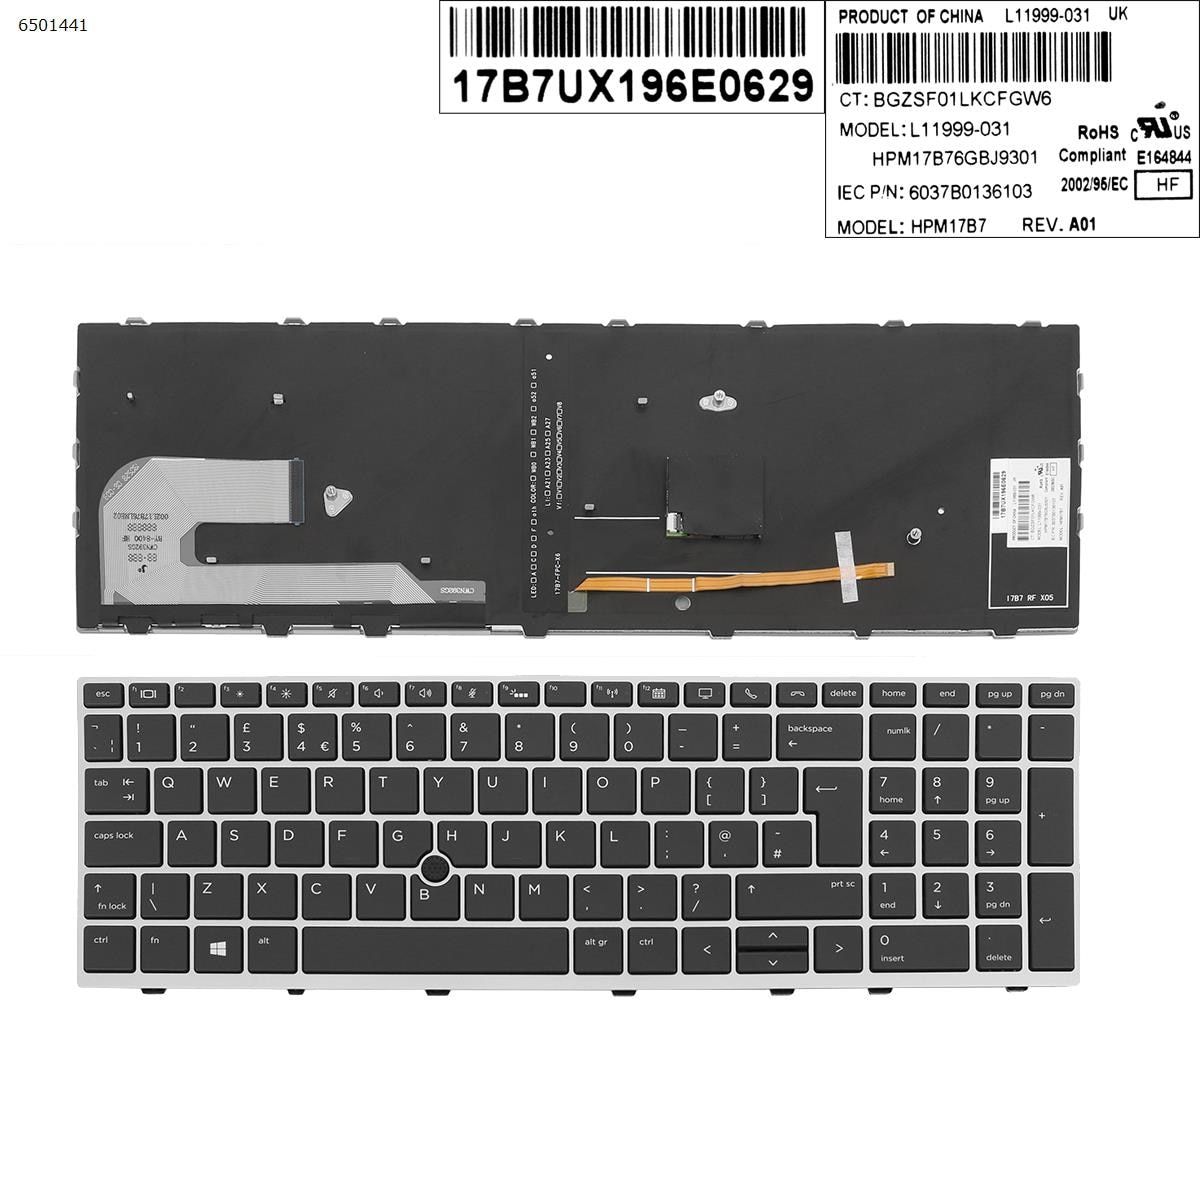 UK جديد استبدال لوحة مفاتيح إتش بي EliteBook 850 G5 755 G5 850 G6 محمول لوحة مفاتيح بإطار فضي أسود مفتاح مع مؤشر الخلفية